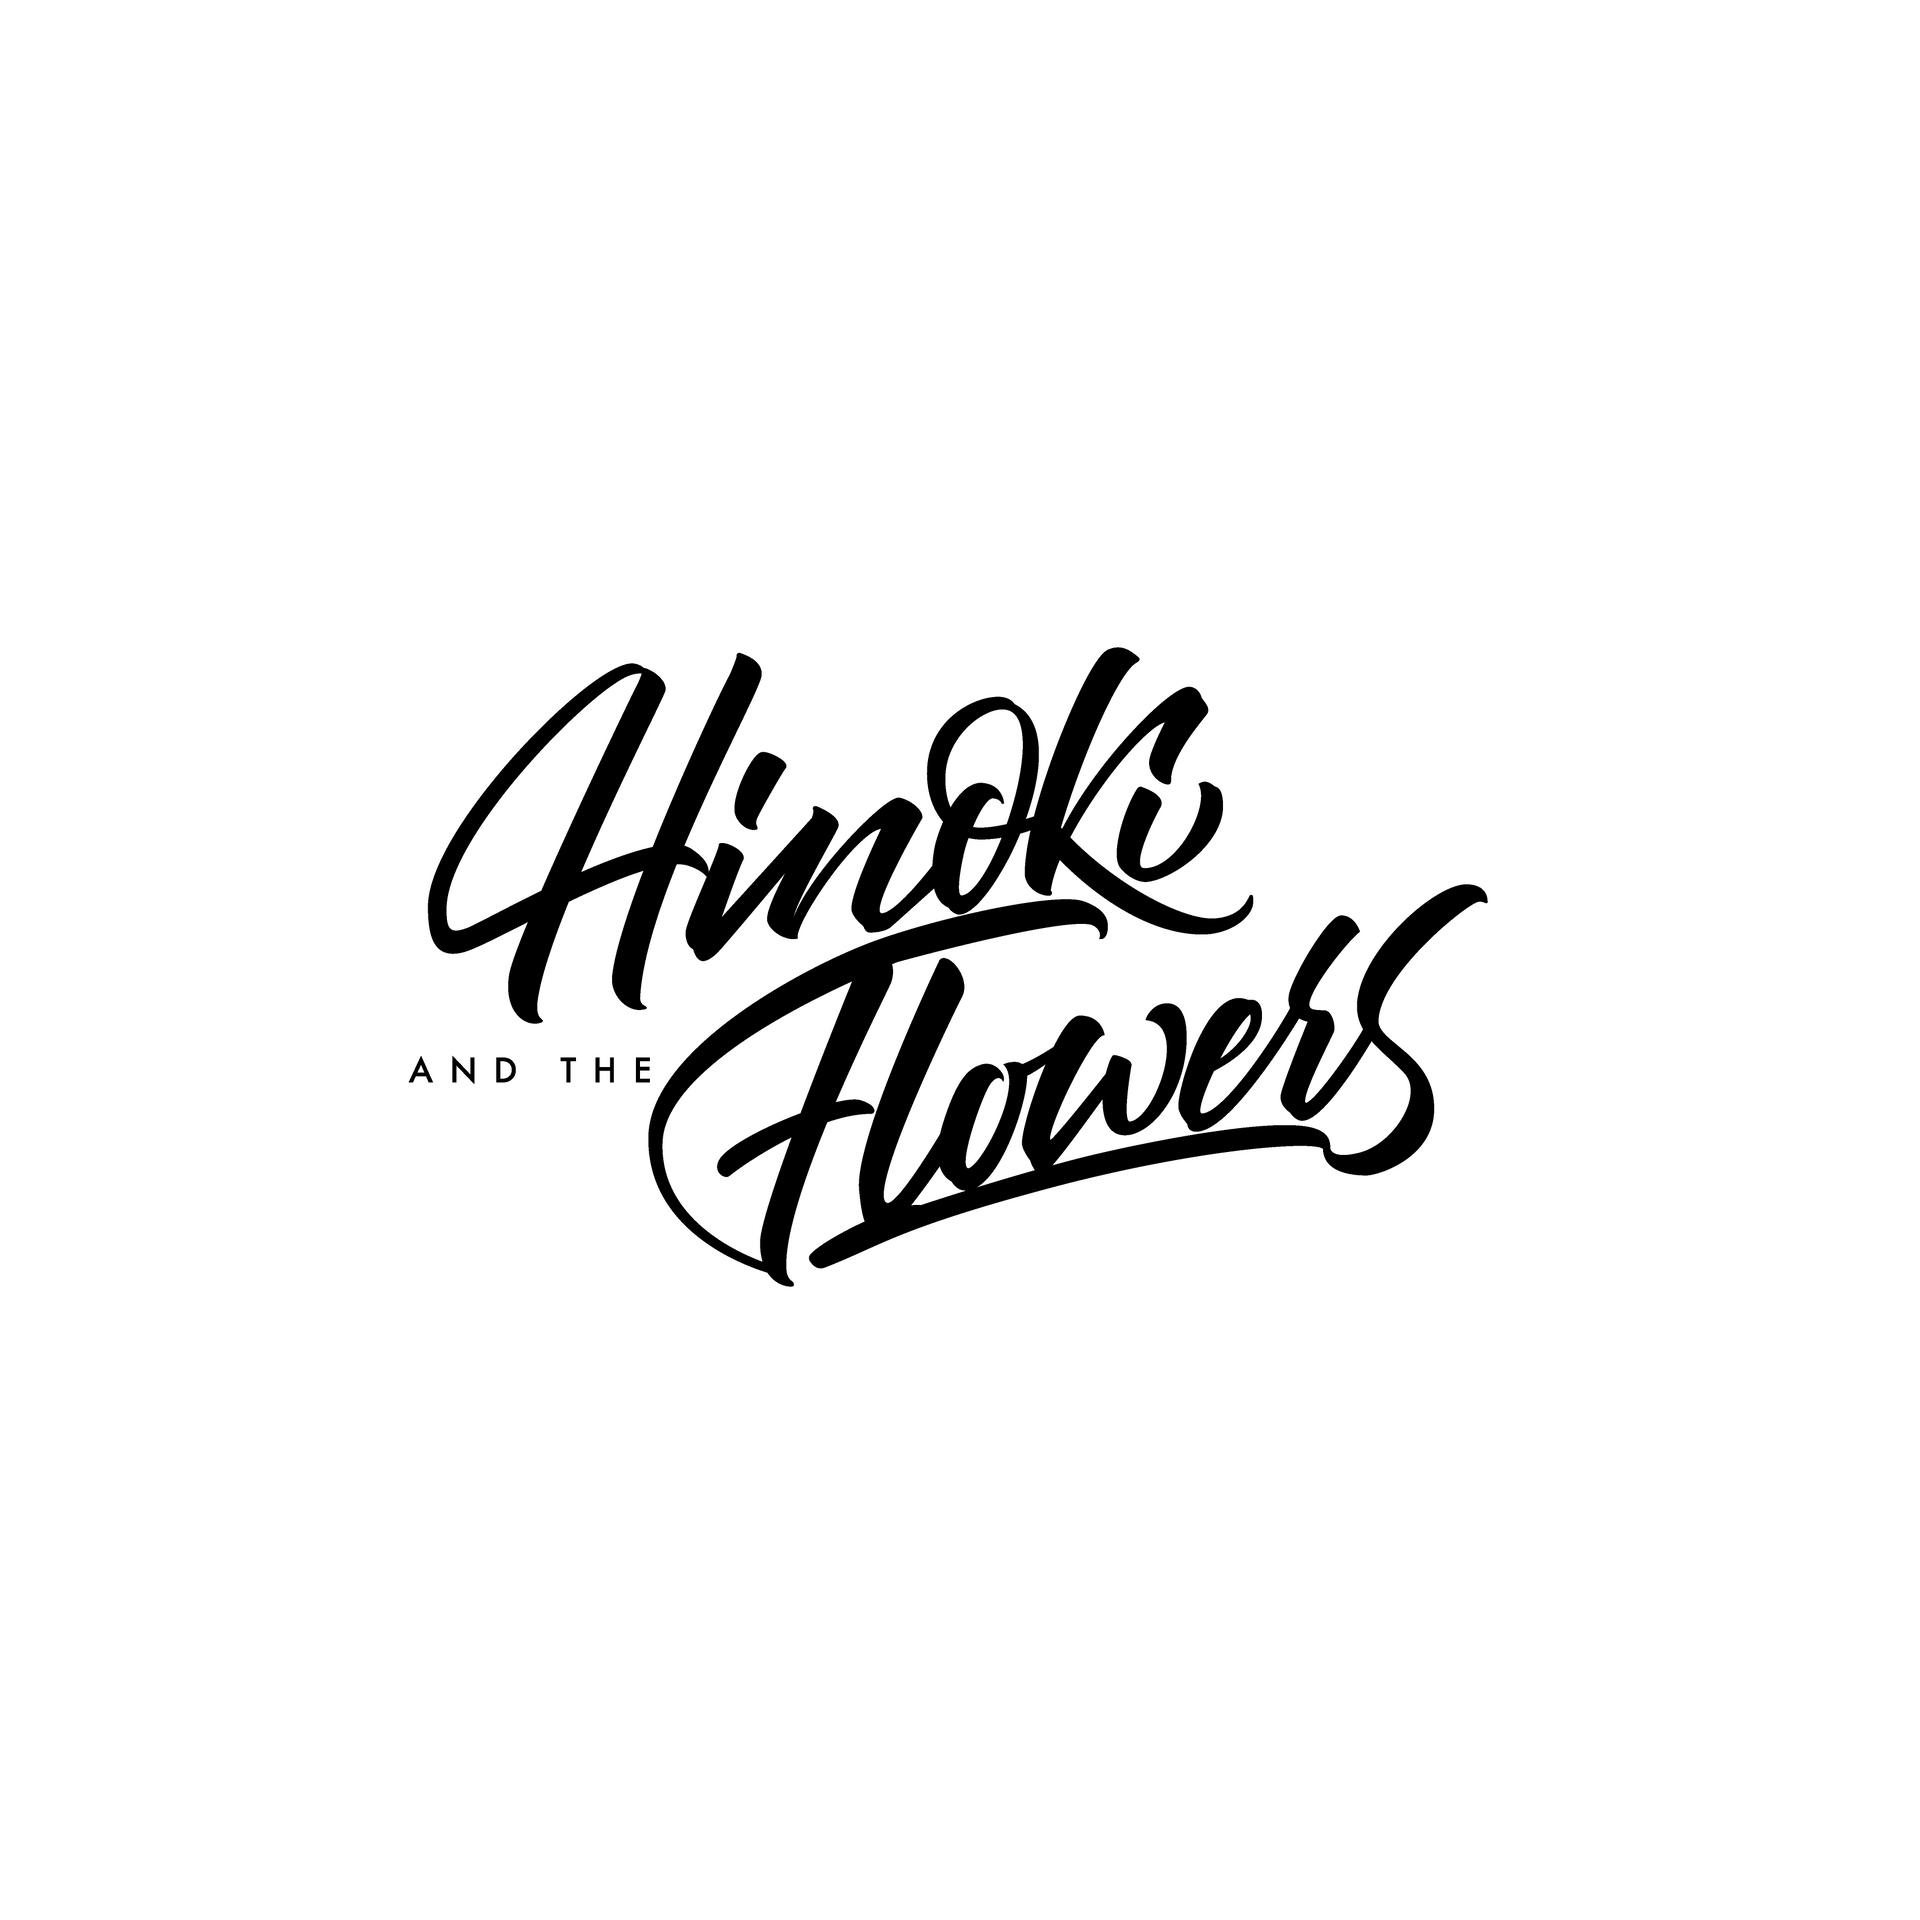 hinokiandtheflowers.png